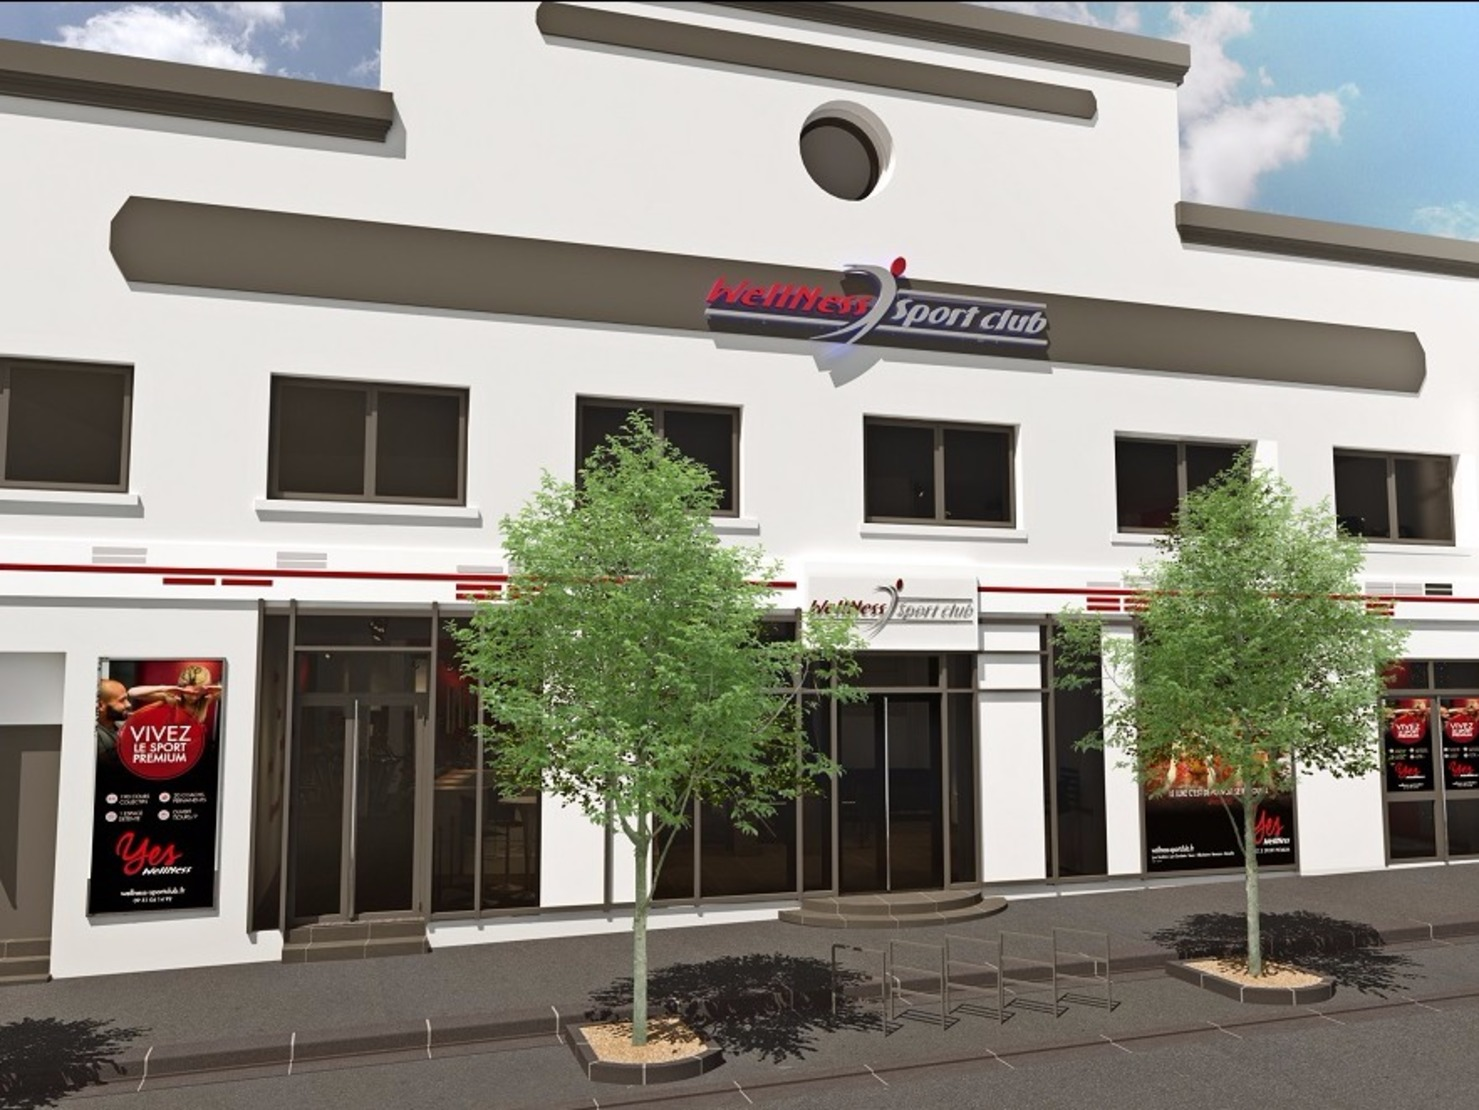 wellness sport club clermont ferrand 224 clermont ferrand tarifs avis horaires essai gratuit